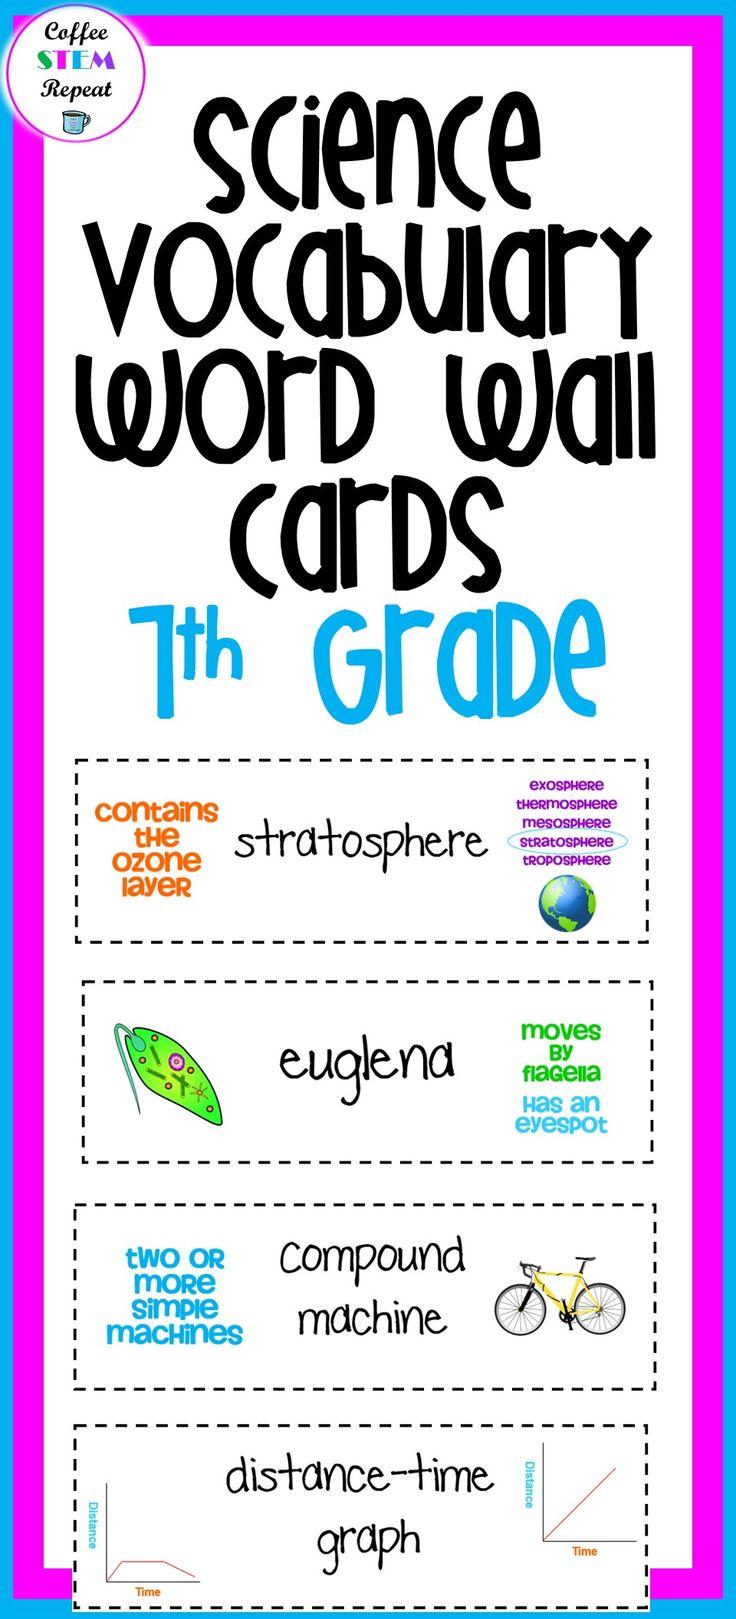 7th science grade vocabulary word wall cards words stuff walls teaching teacherspayteachers sold